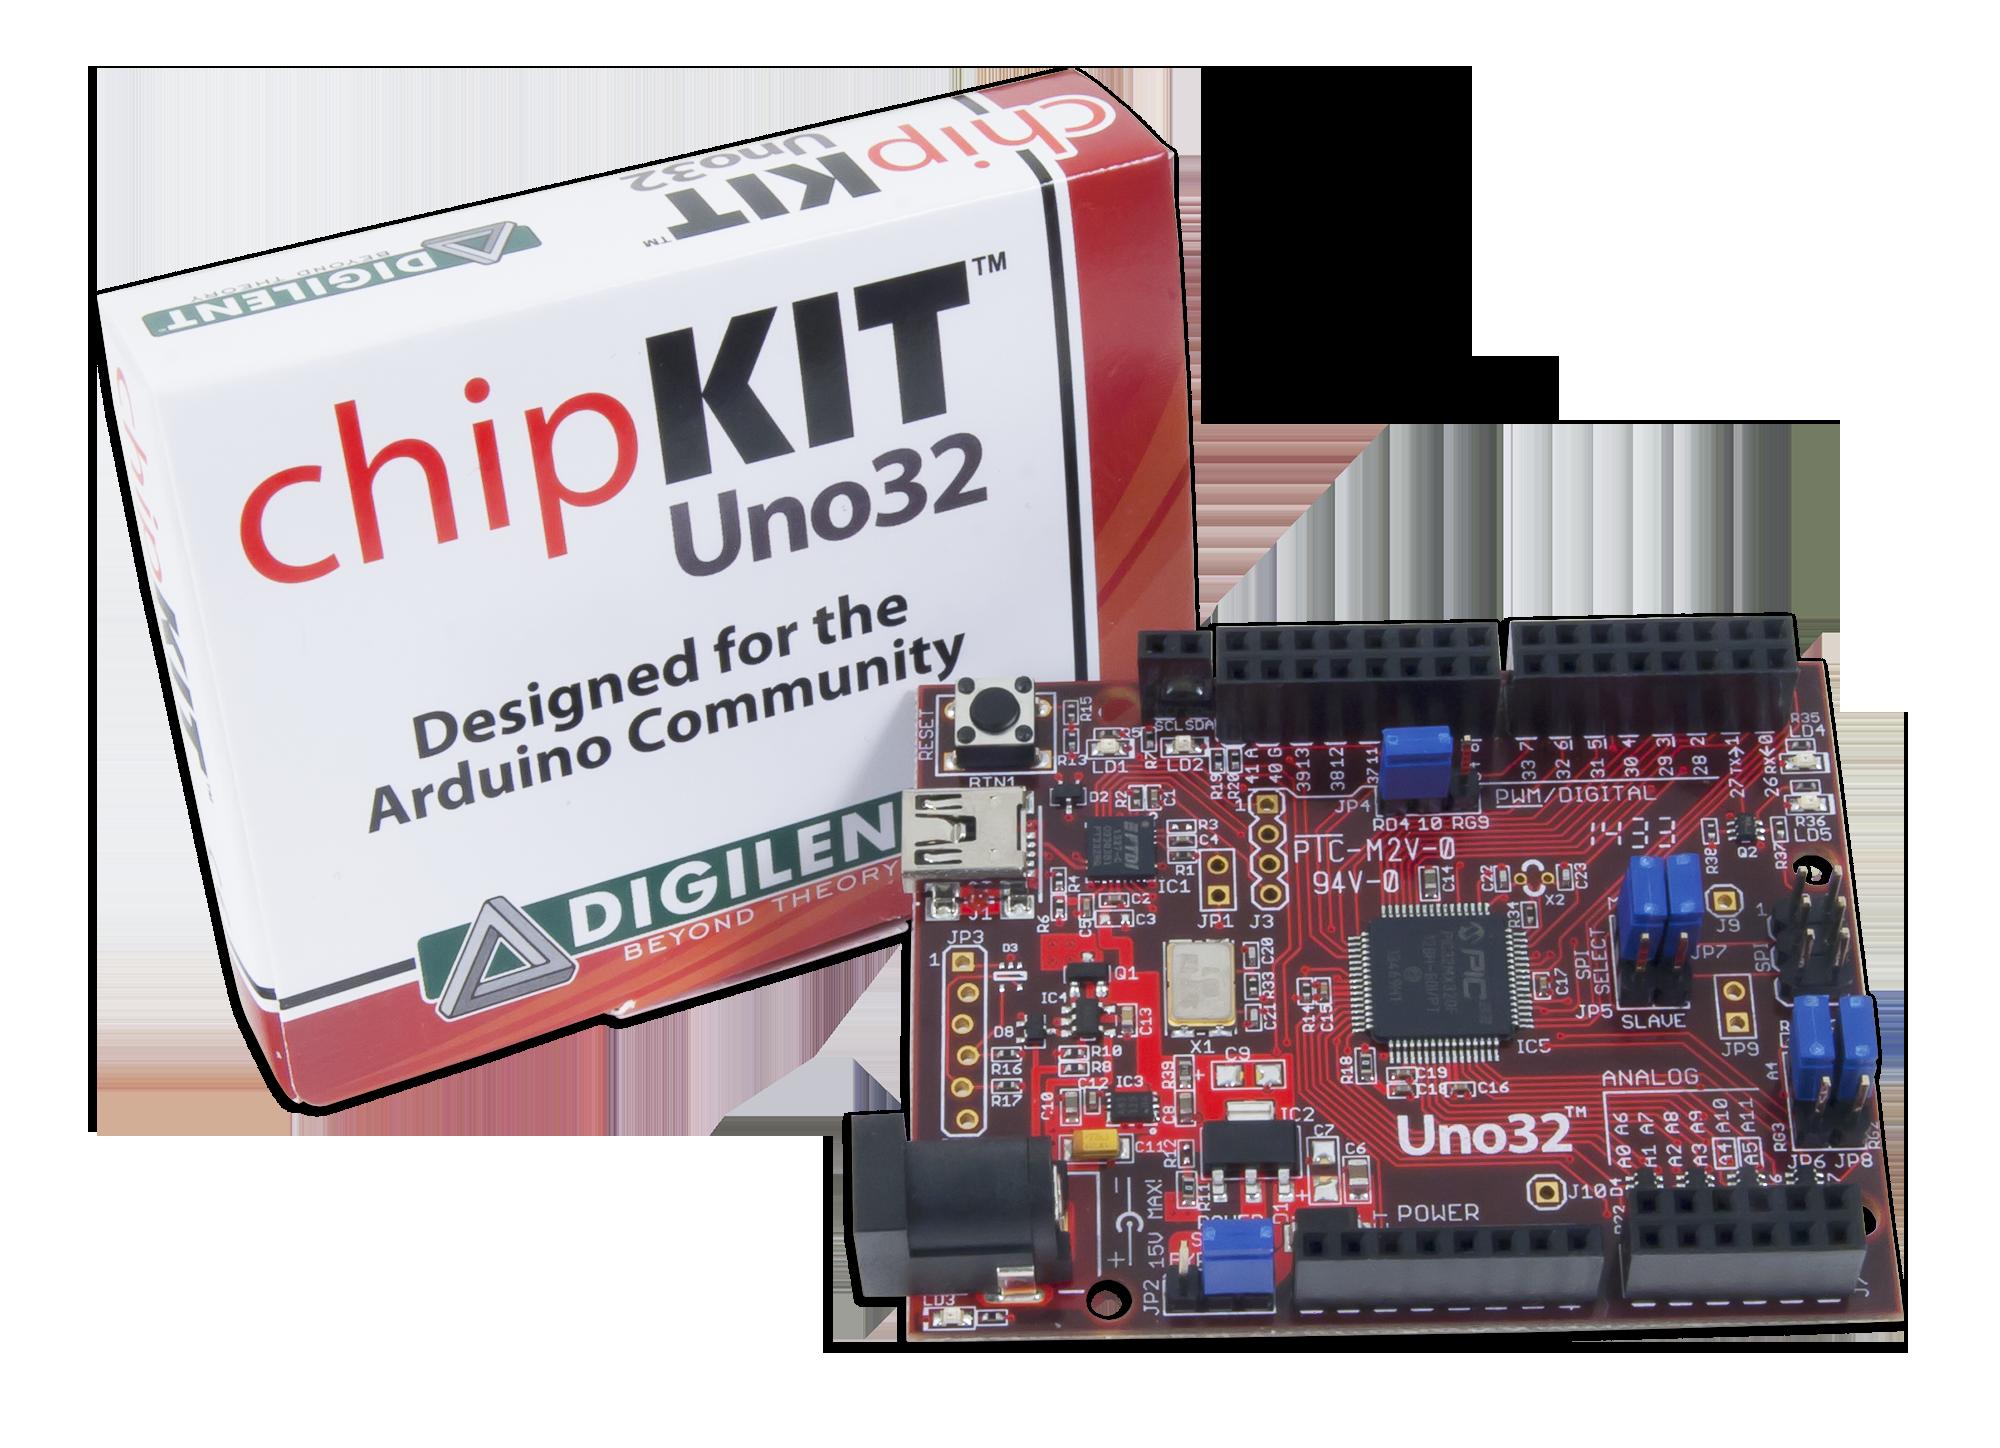 chipkit_uno32:chipkit_uno32-box-2000.png